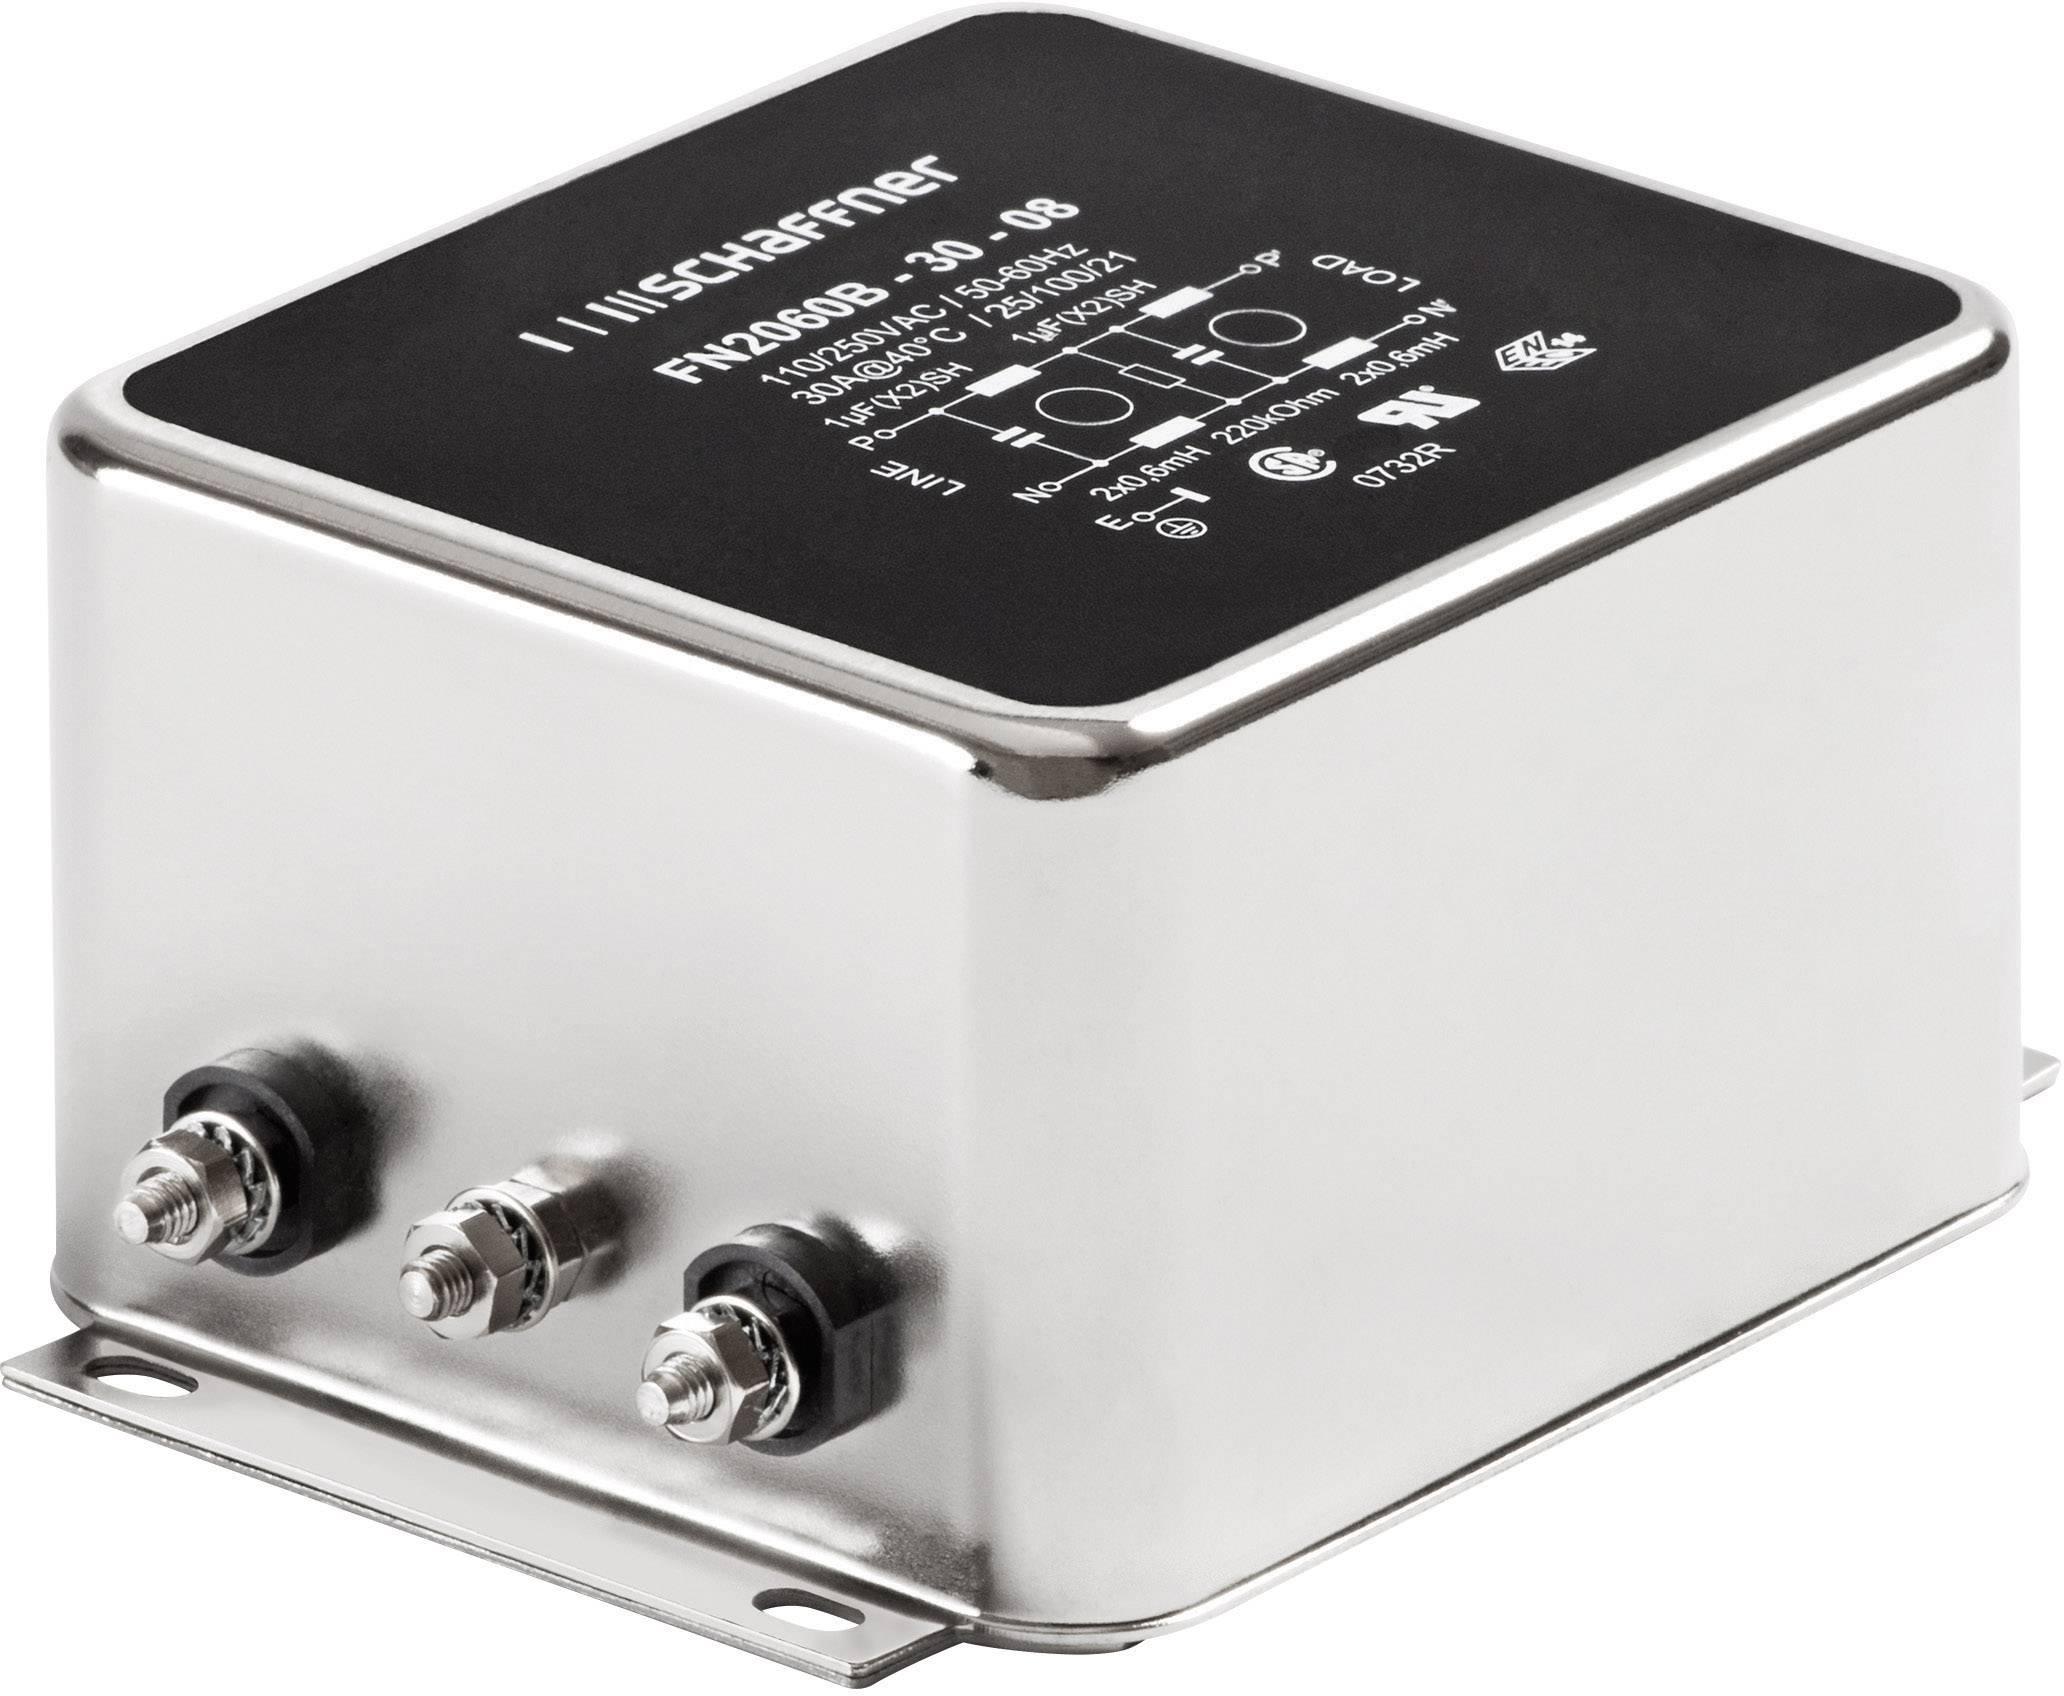 Odrušovací filter Schaffner FN 2060-3-06 FN 2060-3-06, 250 V/AC, 3 A, 2.5 mH, (š x v) 71 mm x 46.6 mm, 1 ks